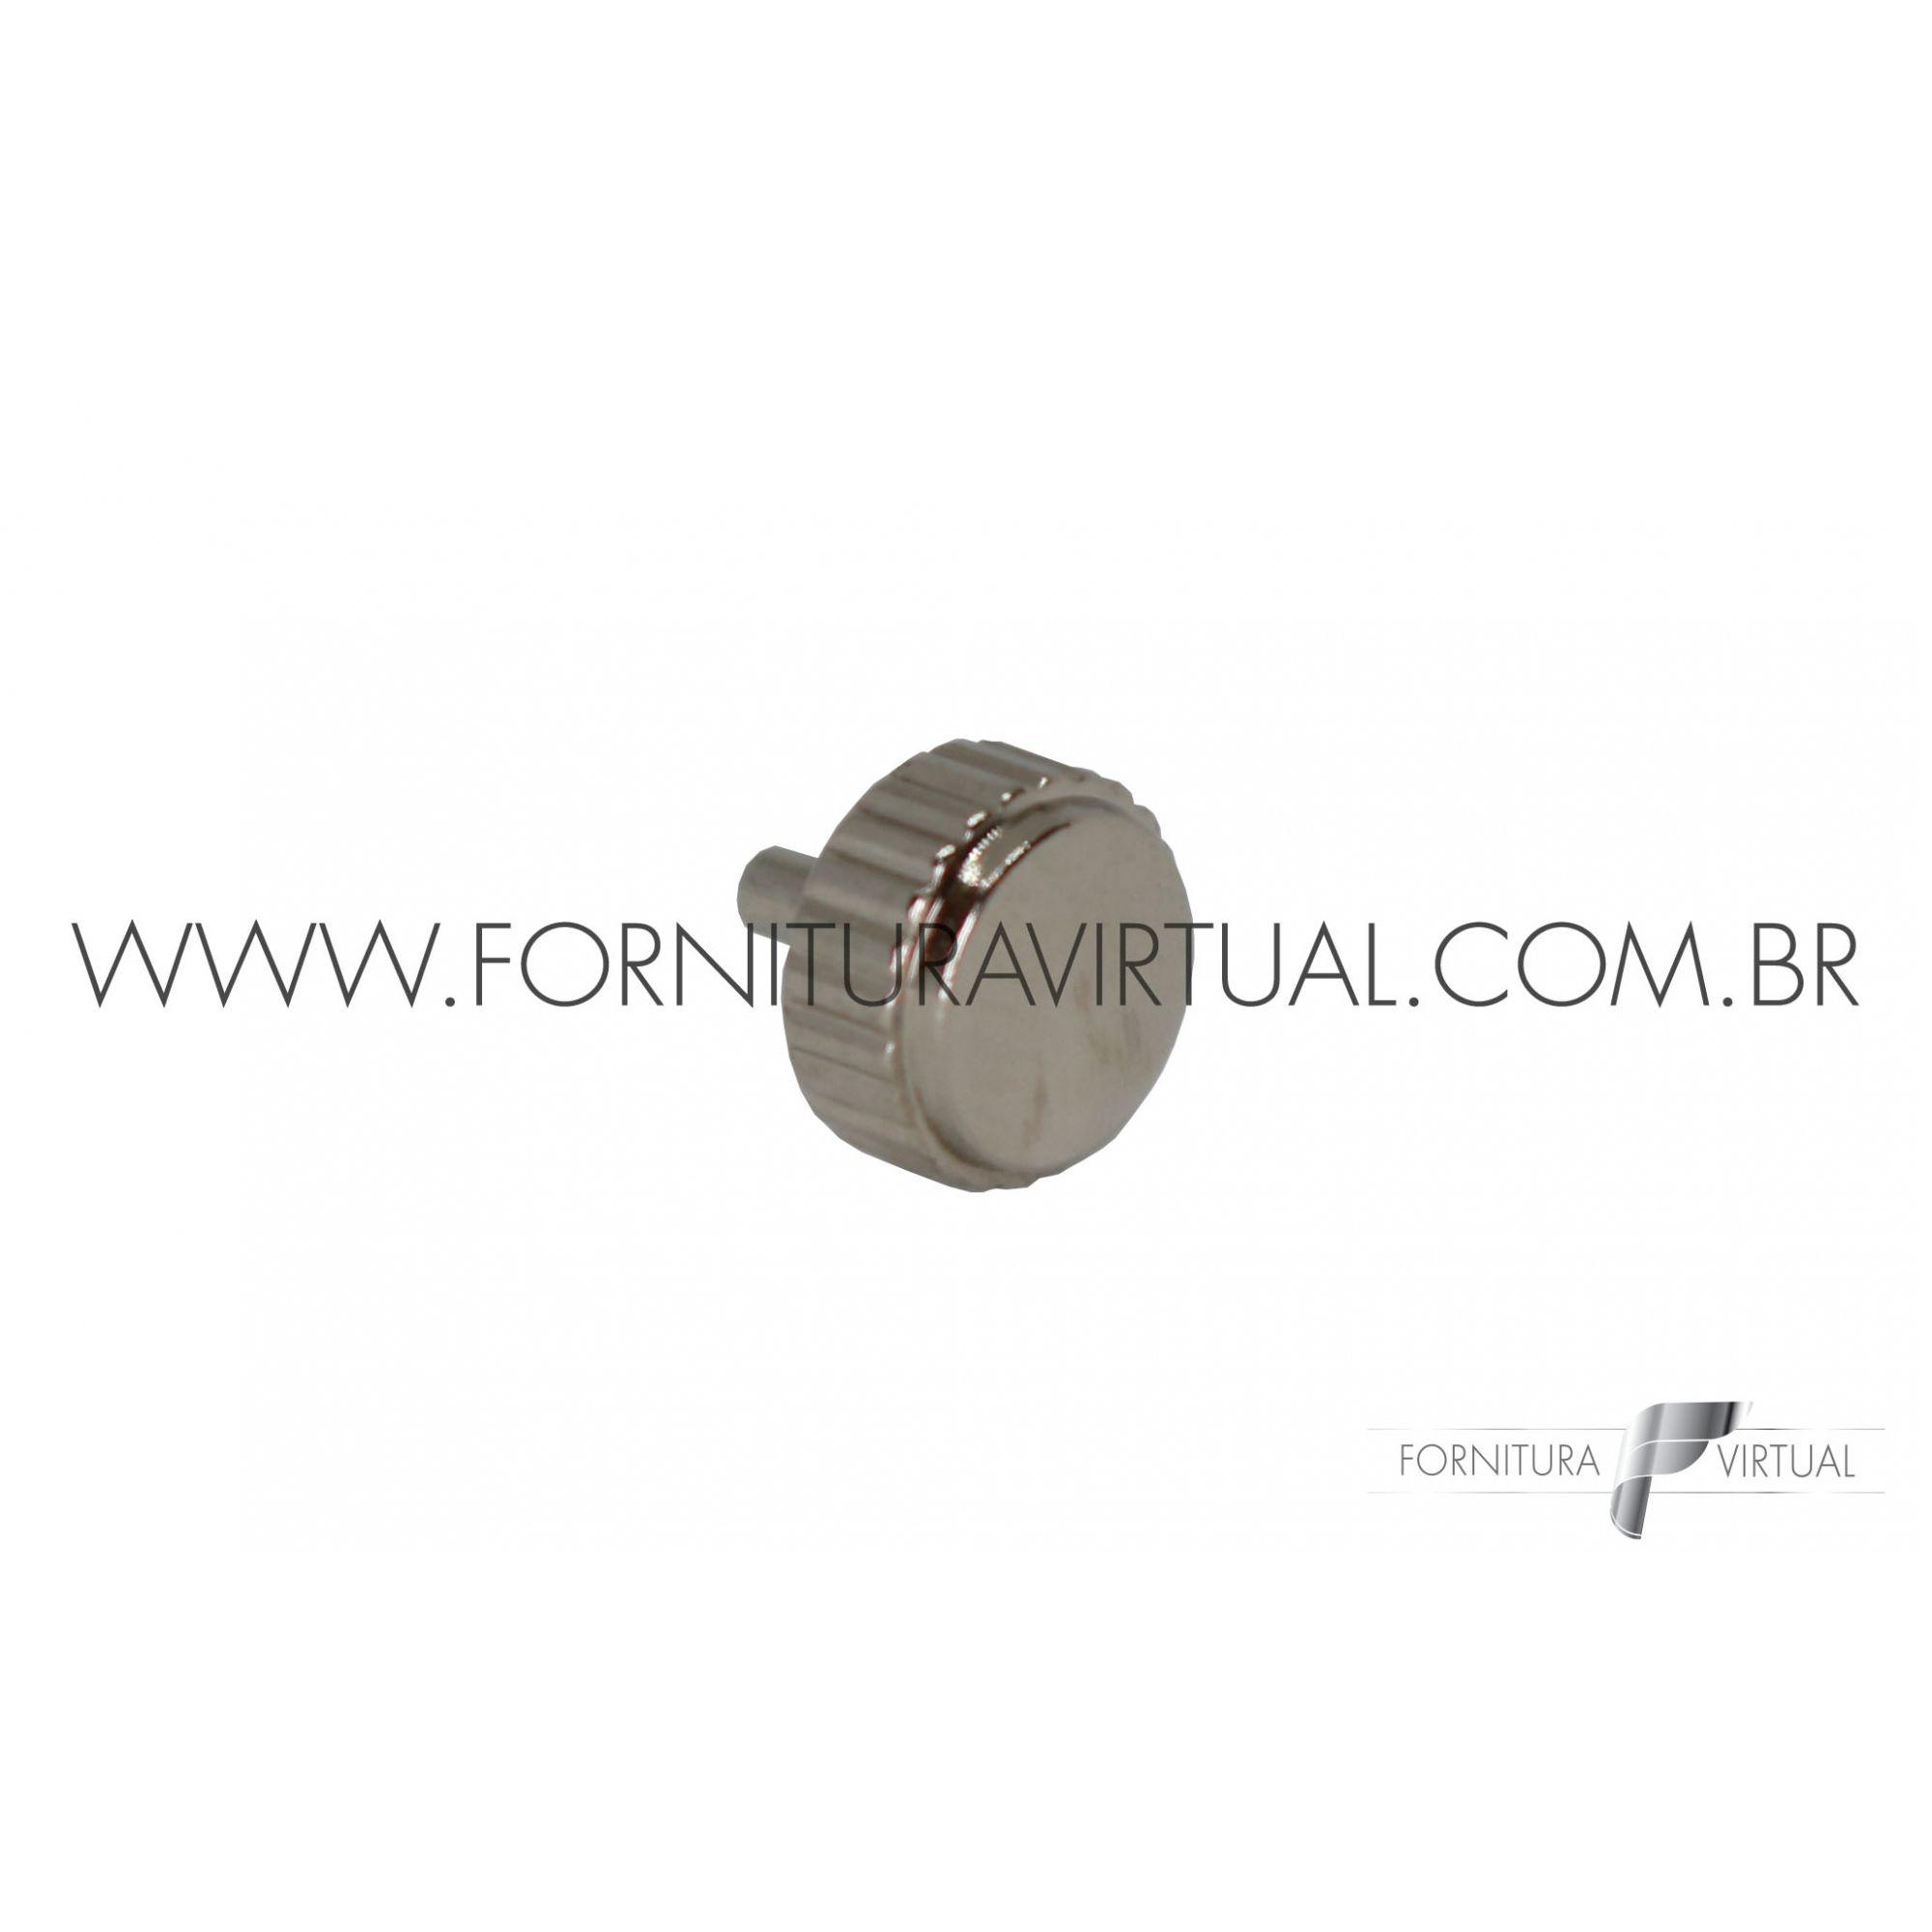 Coroa Capeada - 6.0 x 3.0 x 6.0 - Tubo 2.5